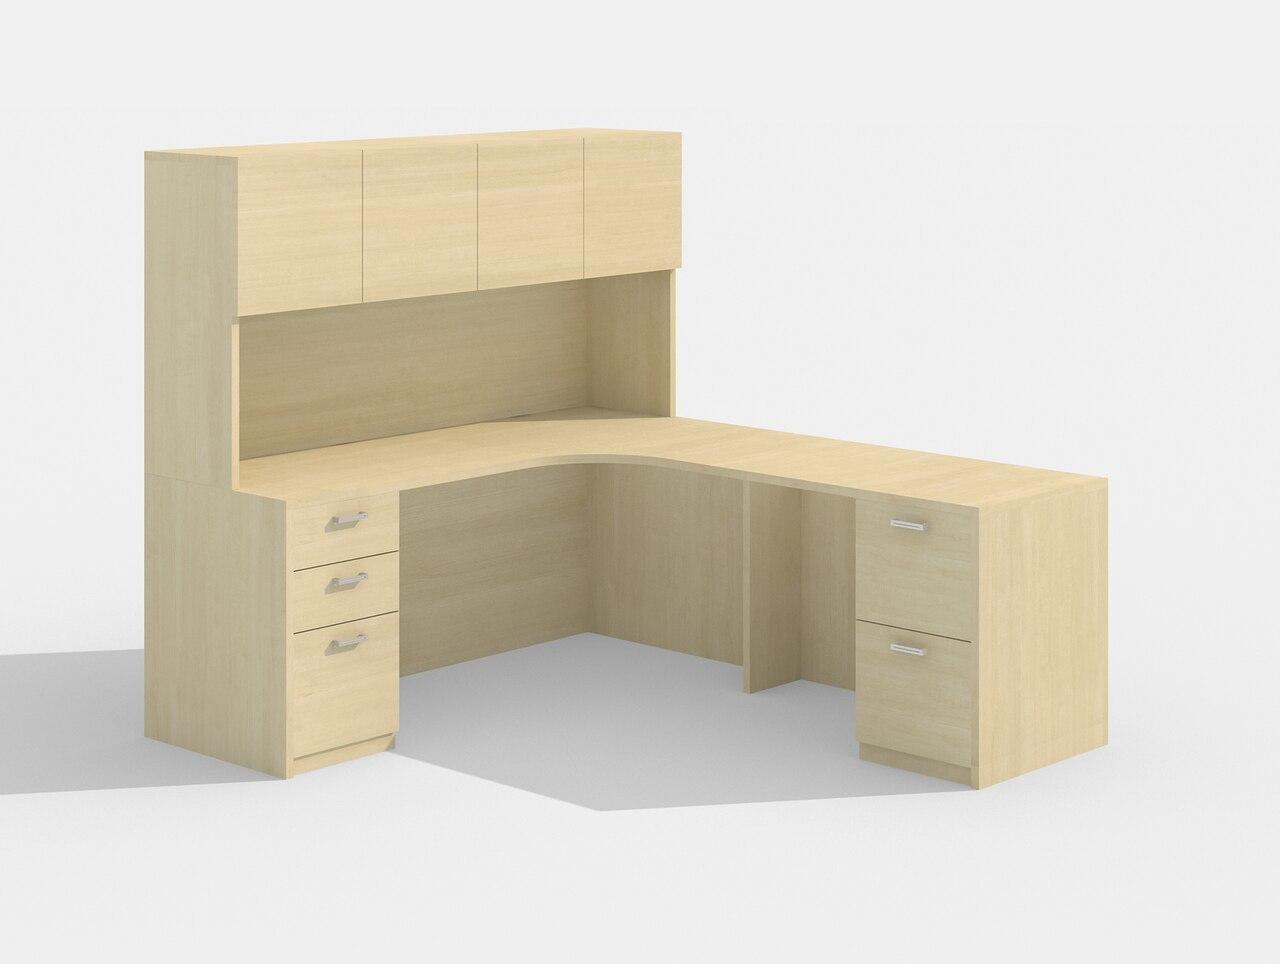 cherryman am-343 l desk with a426 hutch in maple